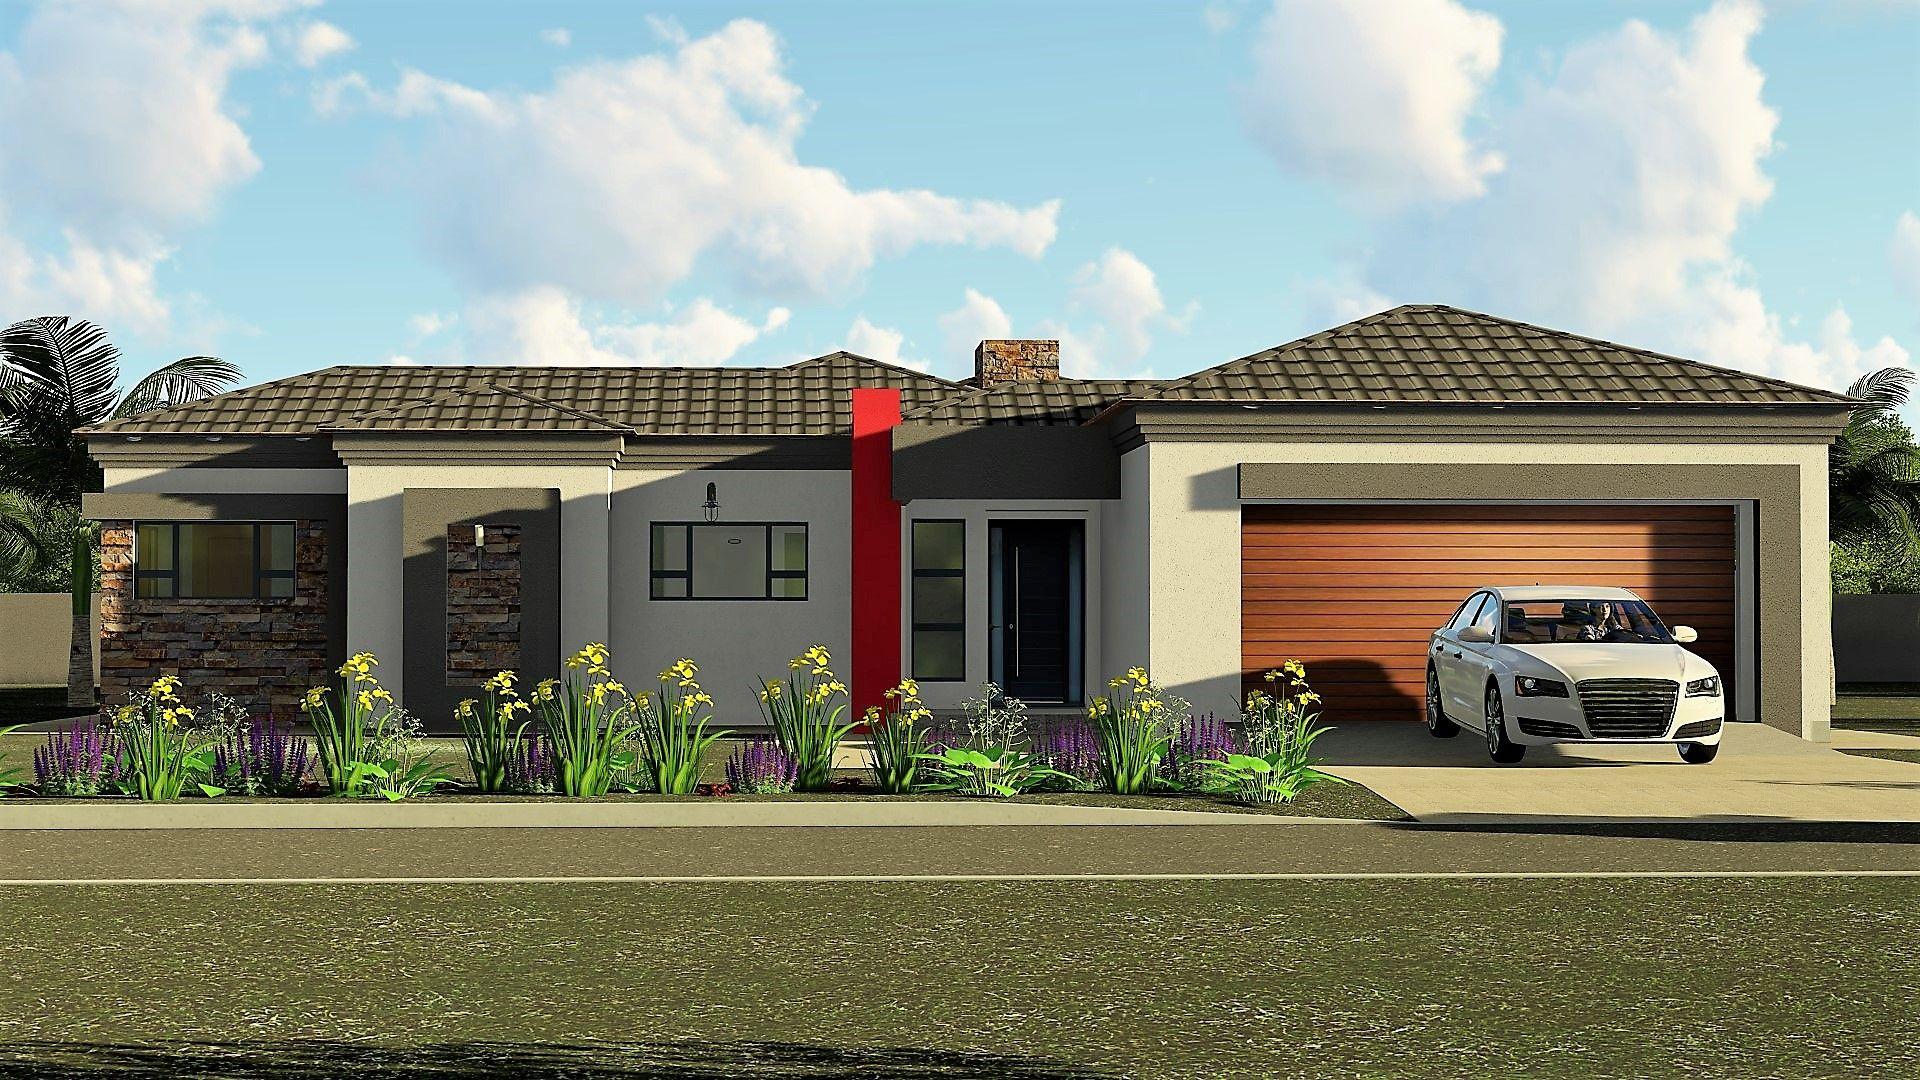 3 Bedroom House Plan Mj 003 1s My Building Plans South Africa In 2020 Bedroom House Plans 3 Bedroom House House Plans